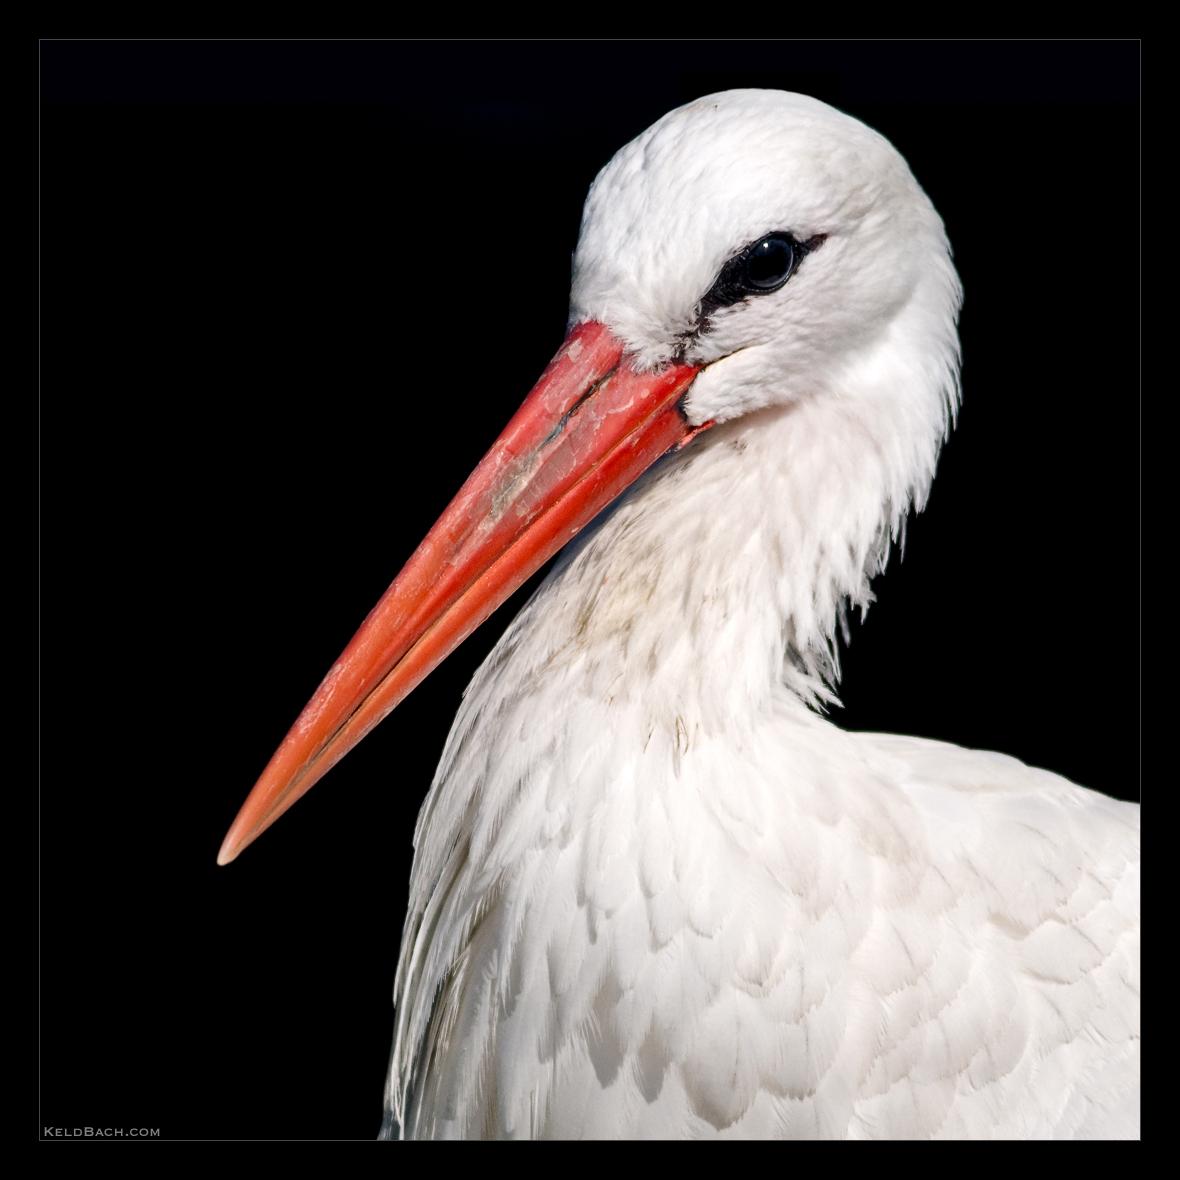 Stork Portrait by KeldBach